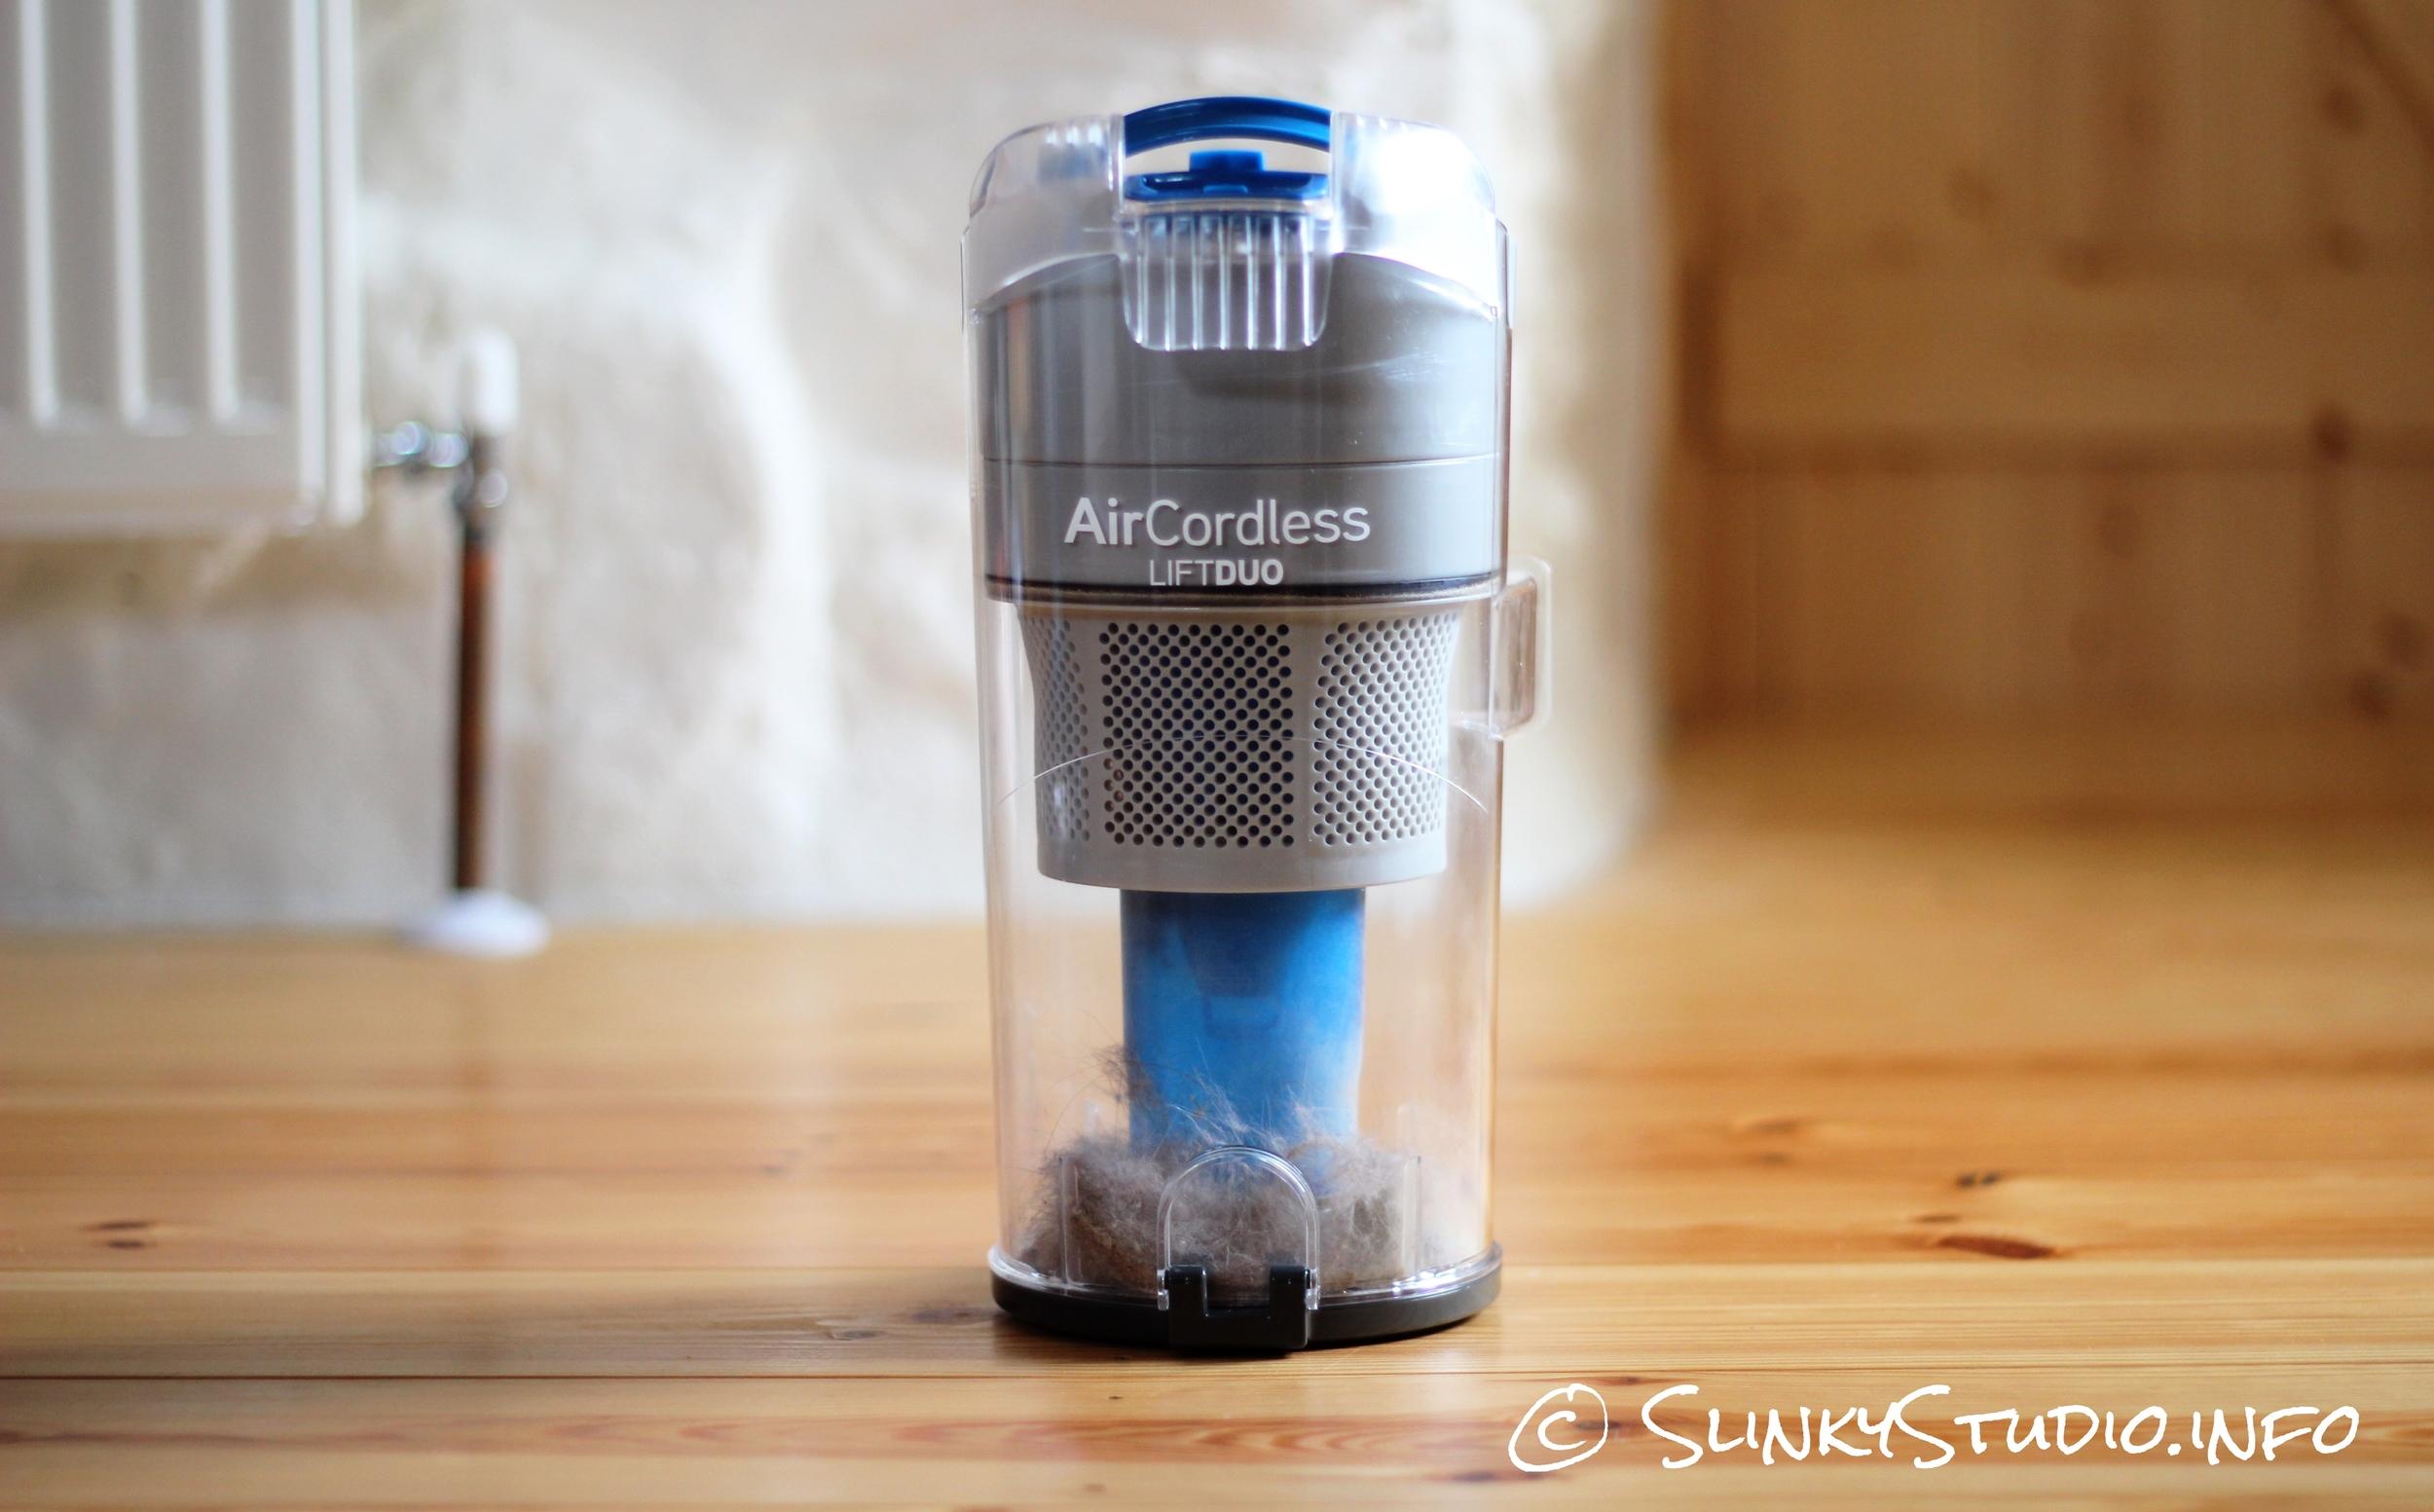 Vax Air Cordless Lift Bin.jpg